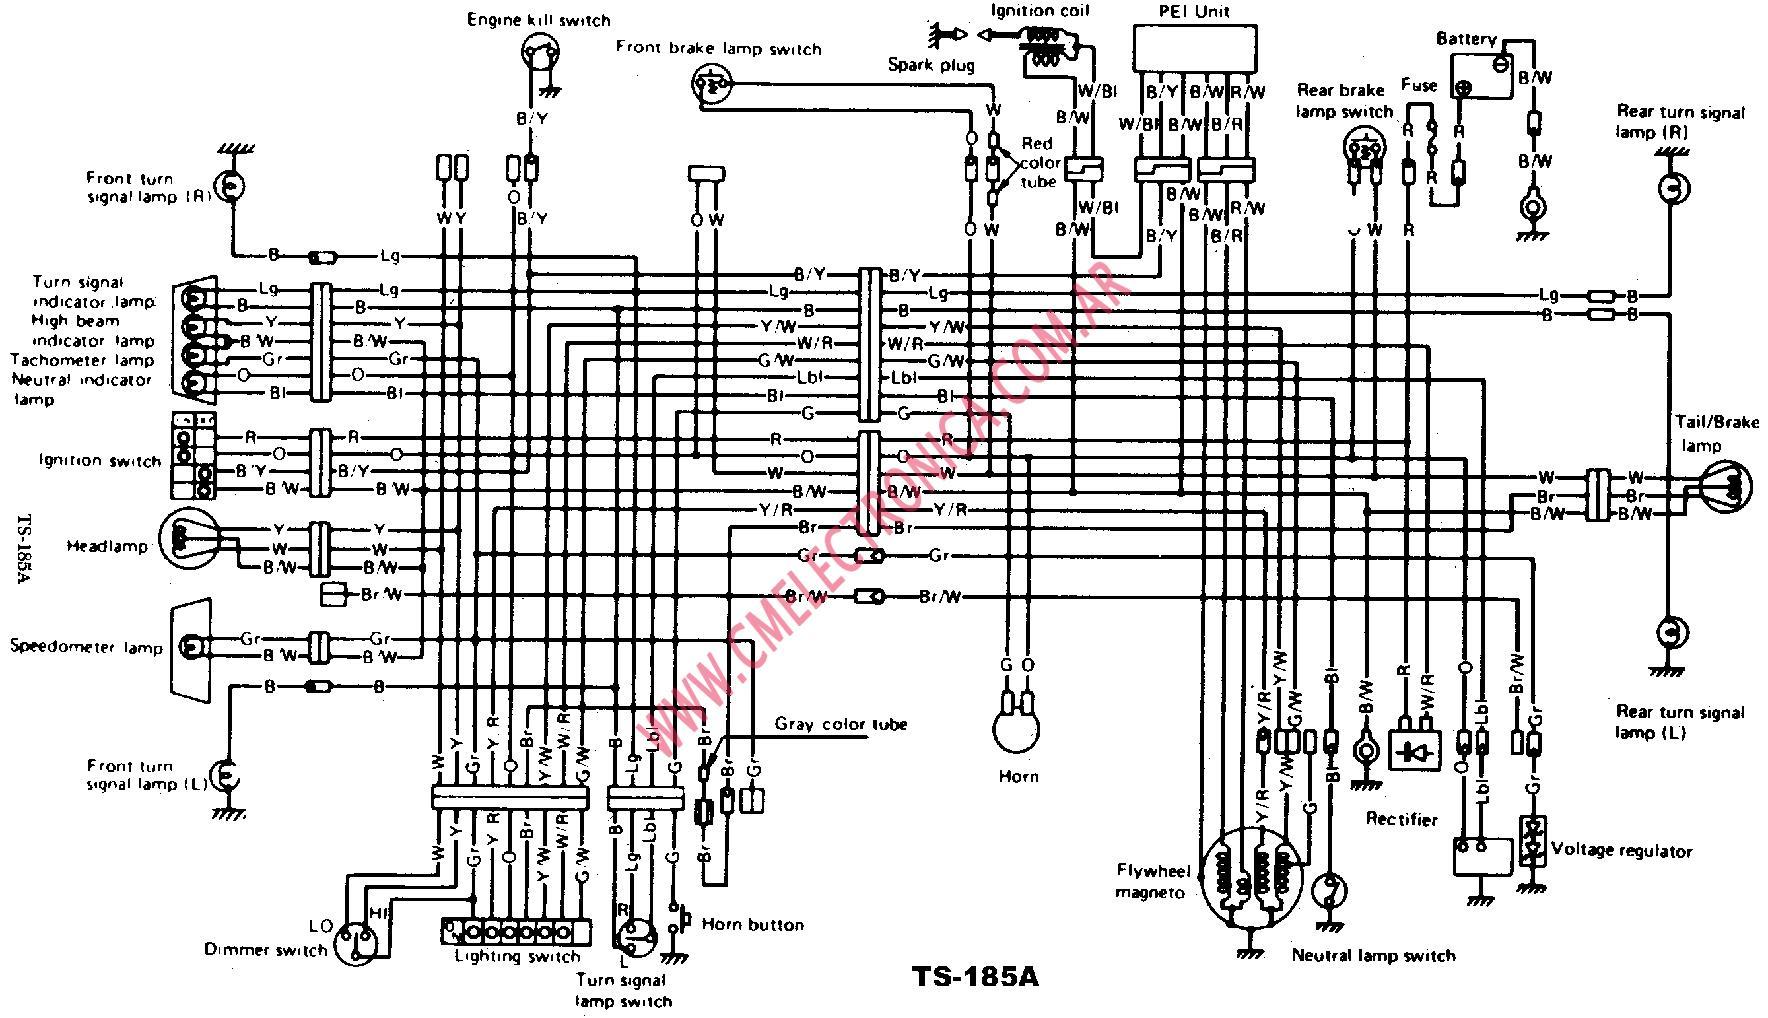 1989 suzuki sidekick wiring diagrams rh 5826  suzuki ts 185 wiring diagram besides suzuki sidekick  wiring diagram besides suzuki sidekick